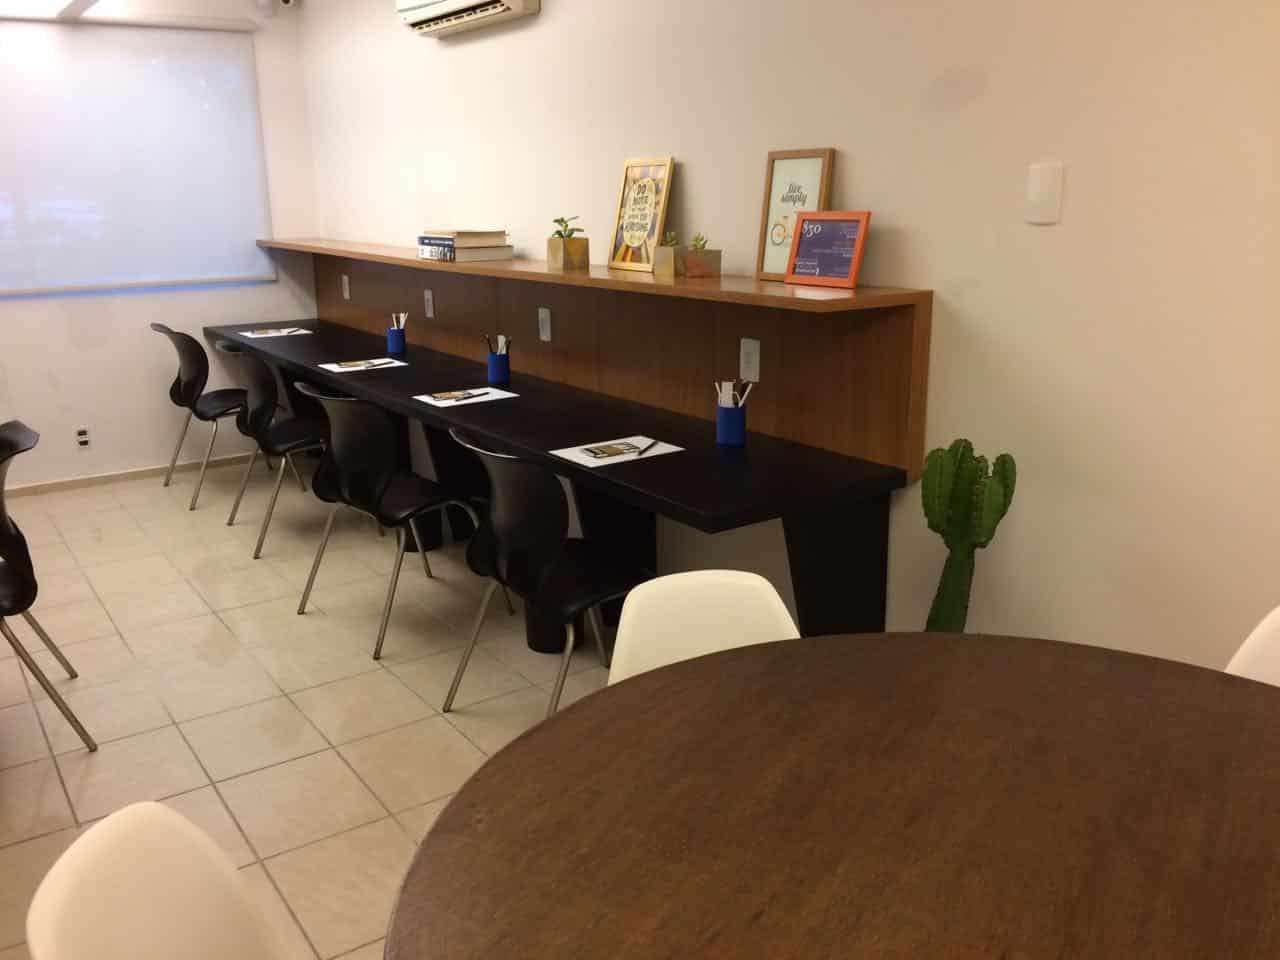 IMG 20160919 WA0027 - Arquitetos ganham coworking exclusivo no Recife